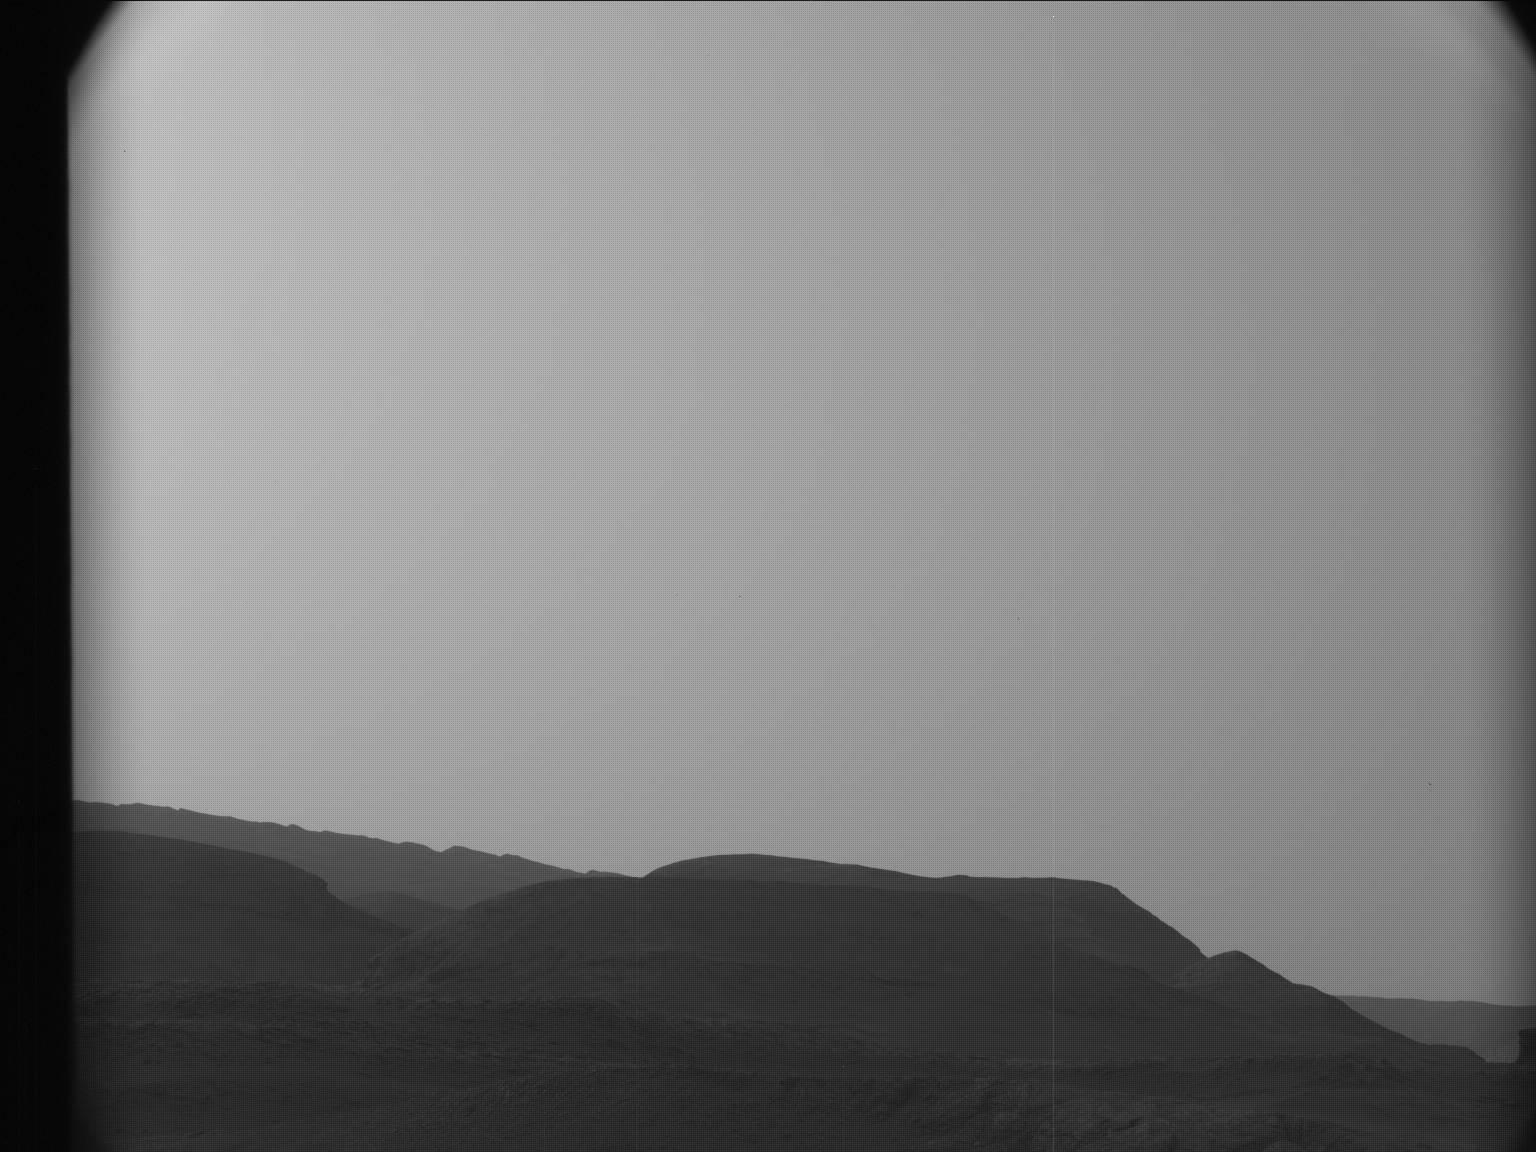 MARS: CURIOSITY u krateru  GALE Vol II. - Page 29 2870ML0149720041100538C00_DXXX